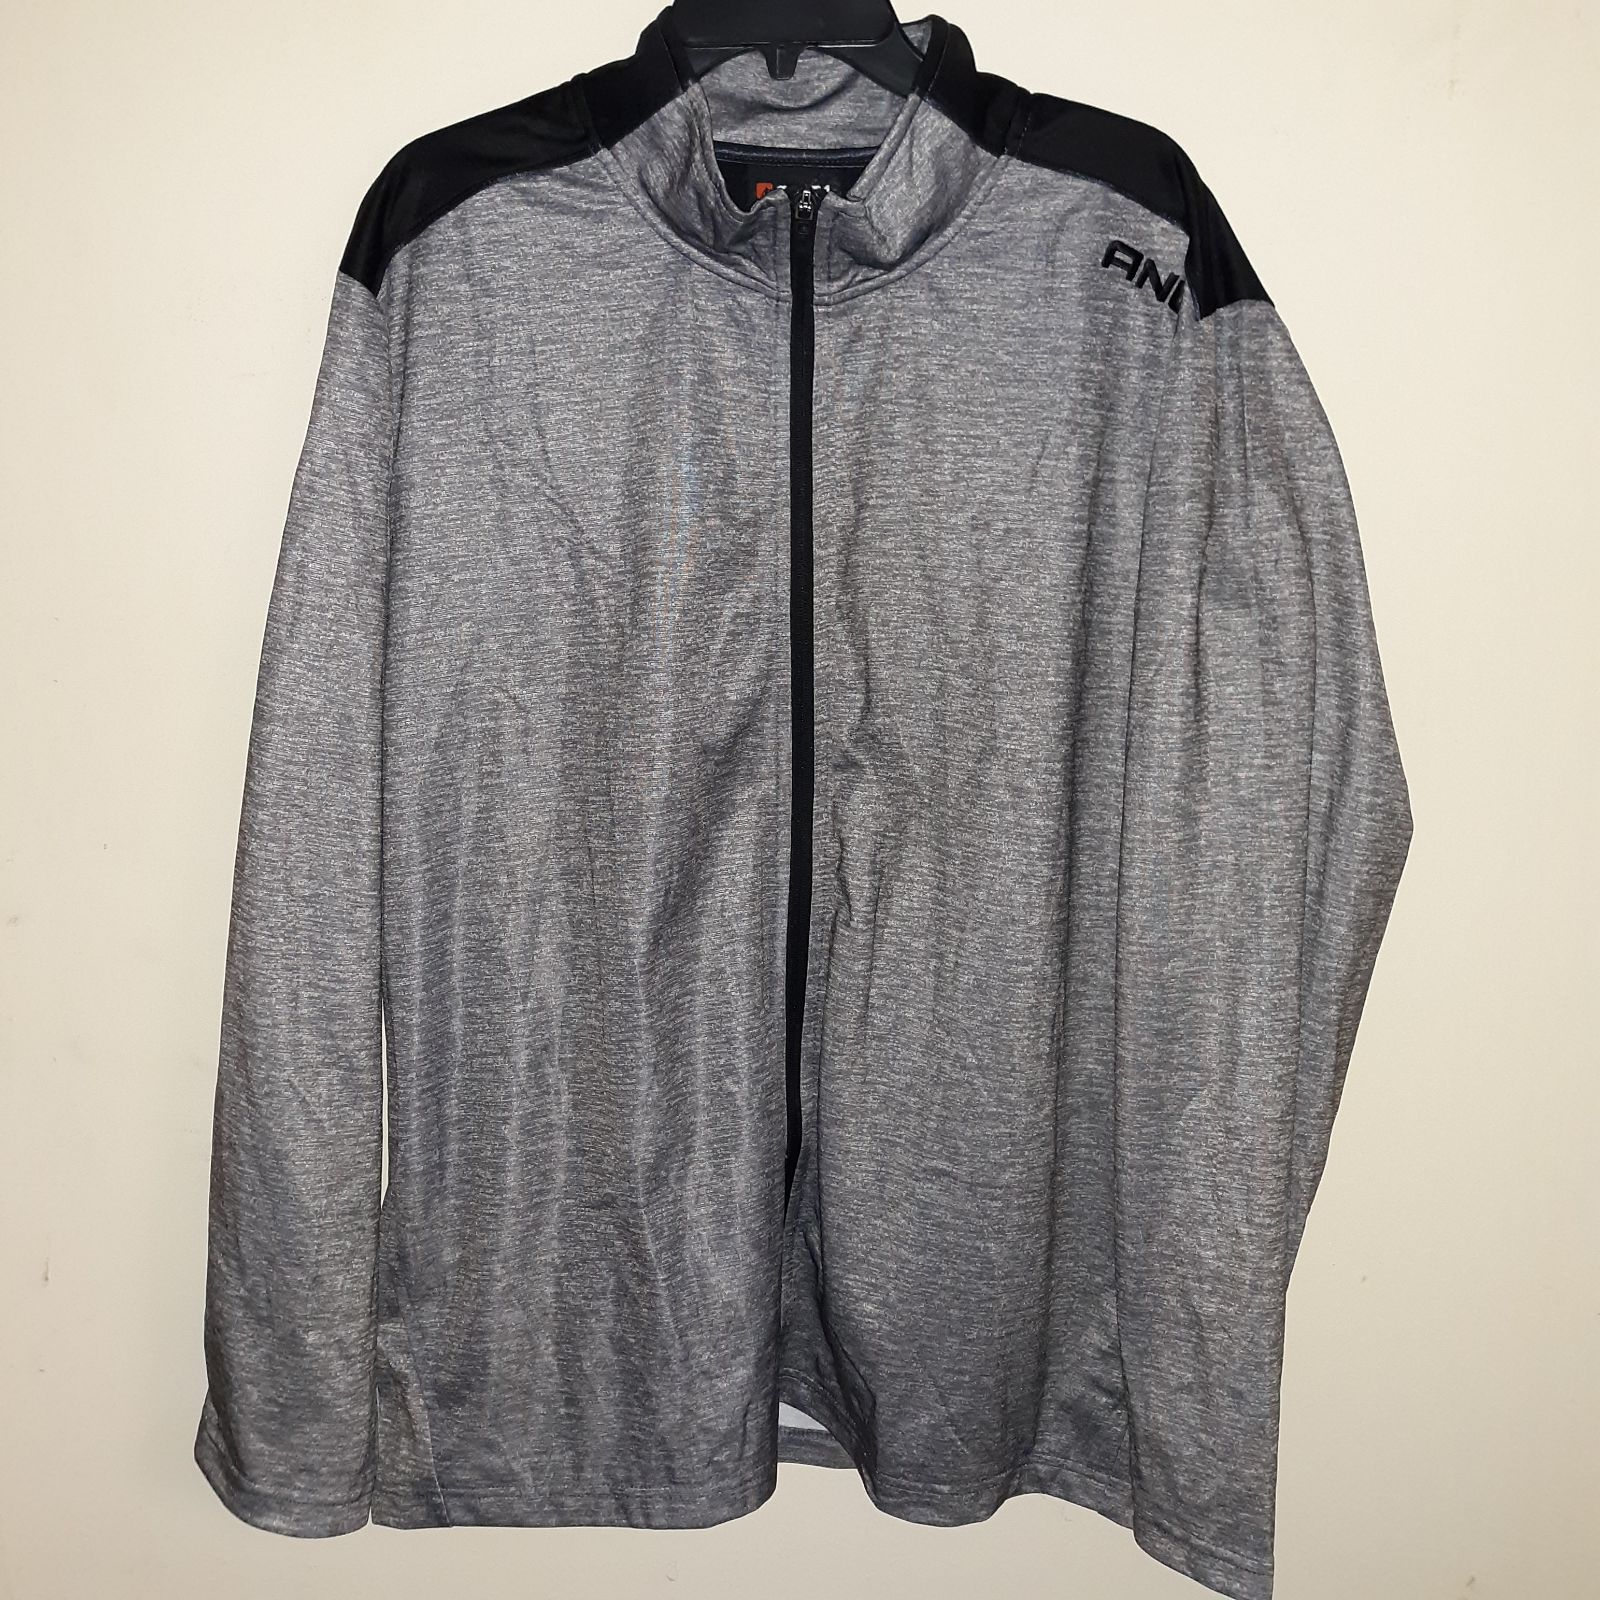 And 1 track jacket Size xxl